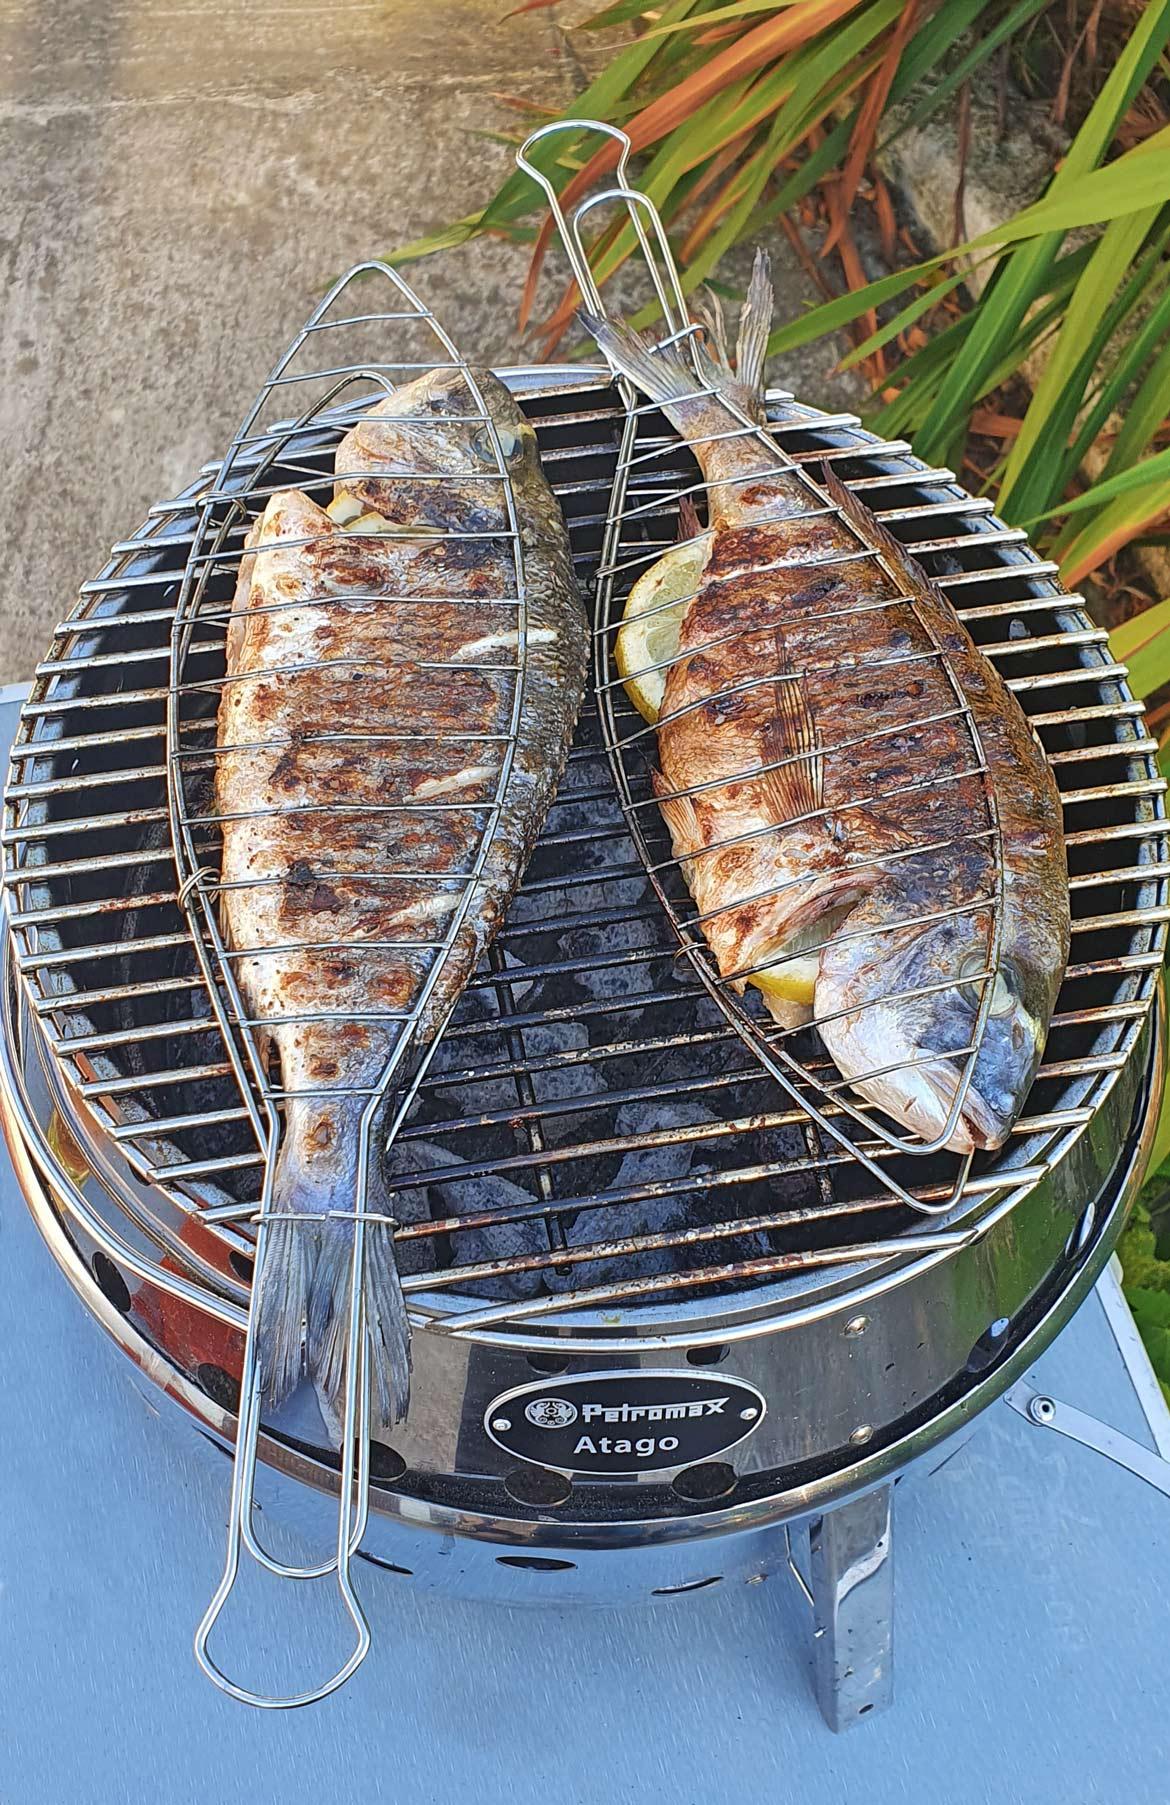 Petromax Atago grillen Fisch